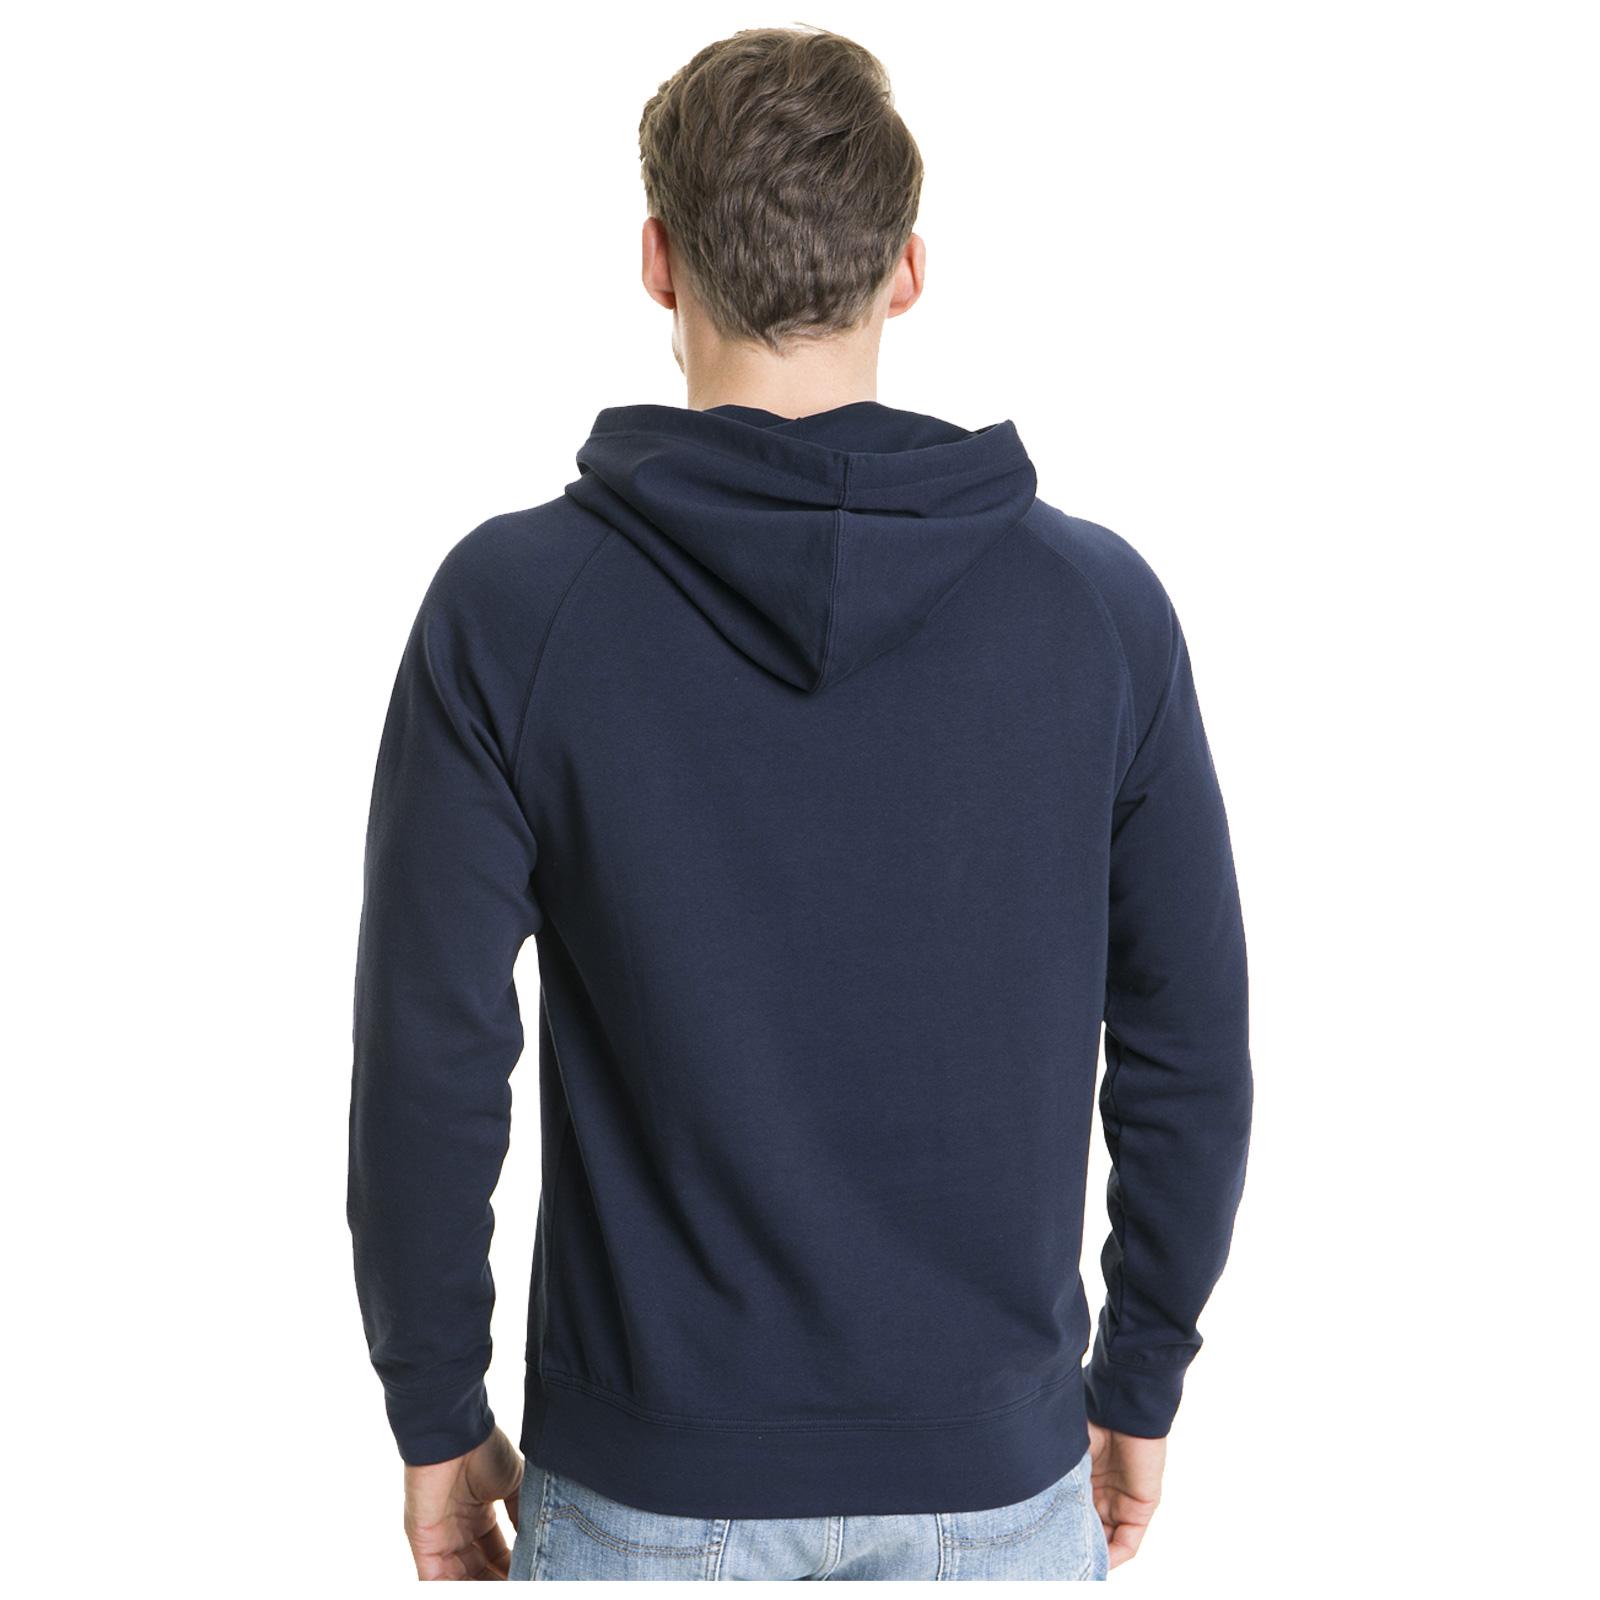 Big-Star-Mens-Hoodie-New-Cotton-Pullover-Full-Zip-Hooded-Casual-Sweatshirt thumbnail 6